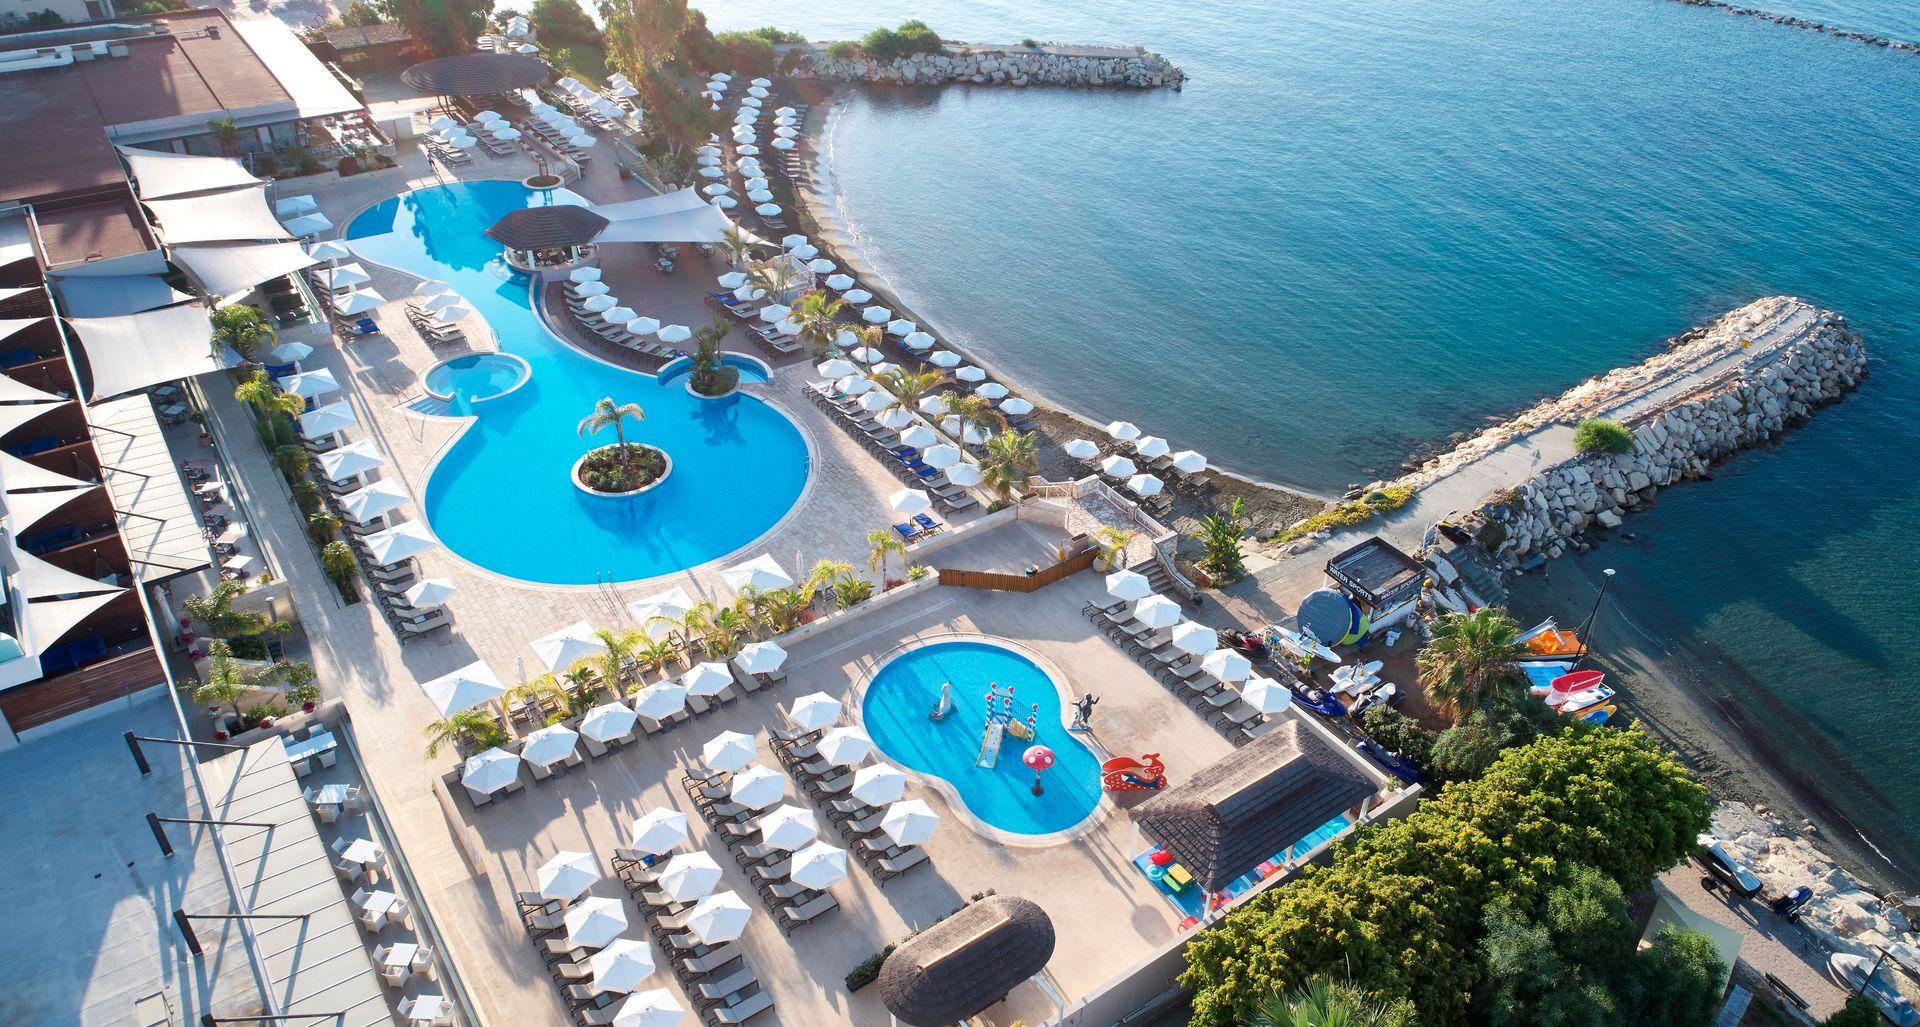 5* The Royal Apollonia Limassol - Κύπρος ✦ 2 Ημέρες